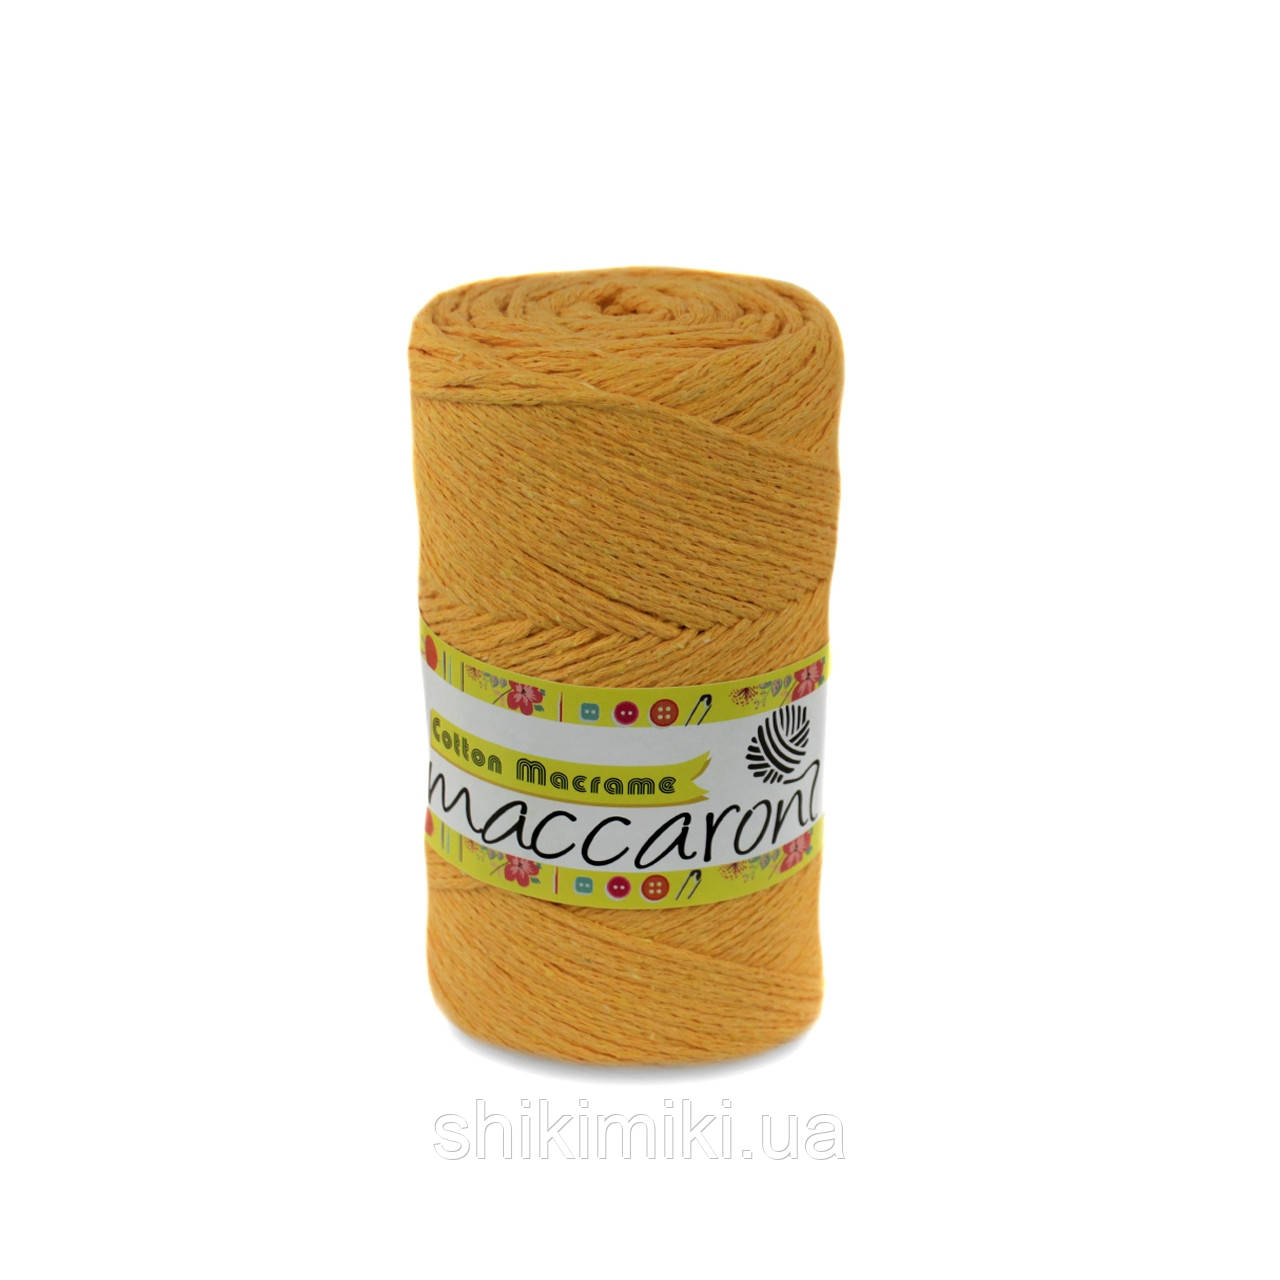 Трикотажный шнур Cotton Macrame, цвет горчичный